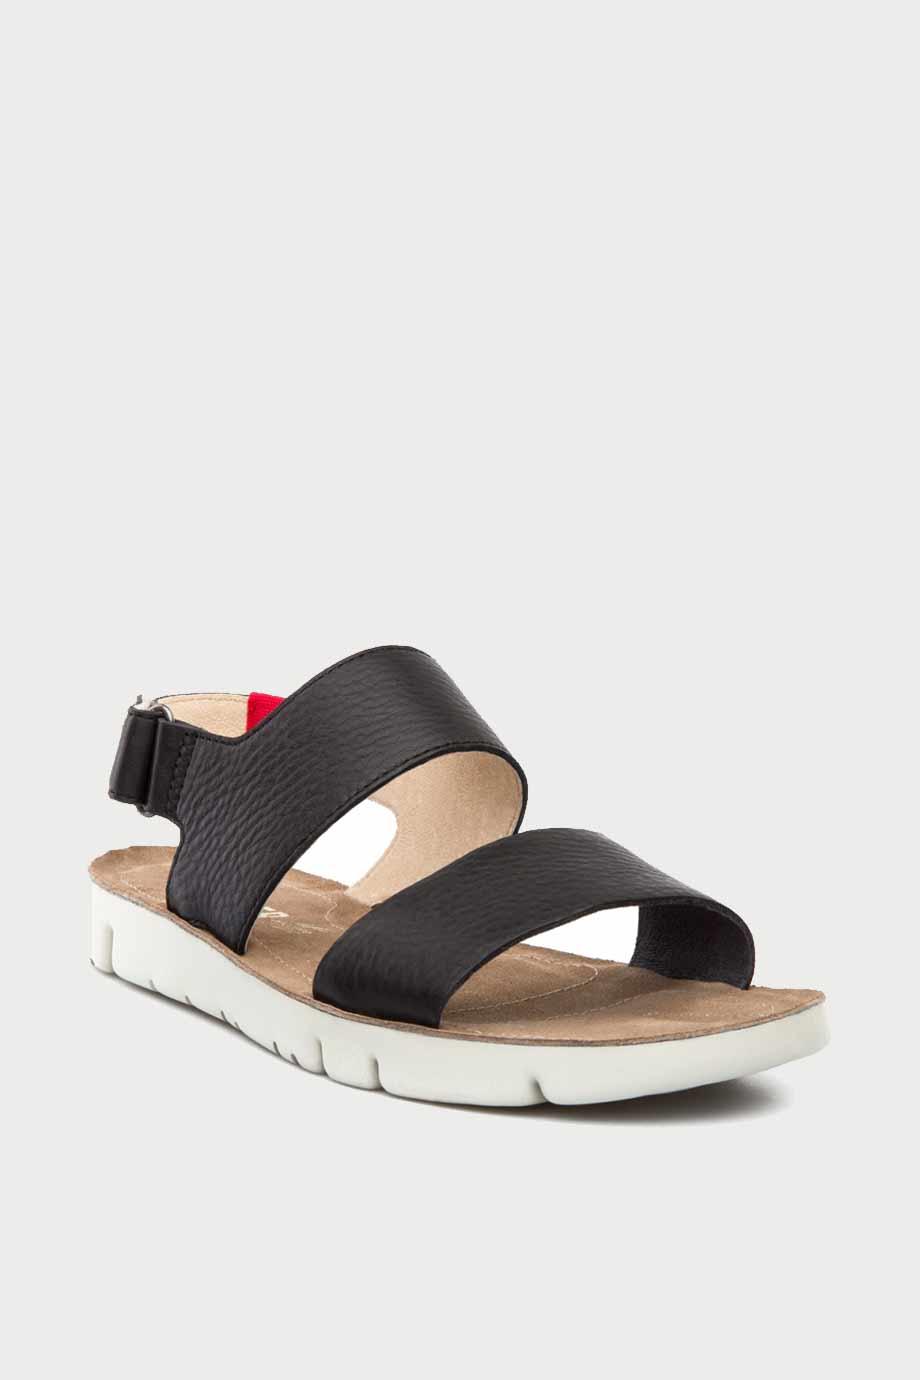 spiridoula metheniti shoes xalkida p Camper 18868 003 Oruga 2